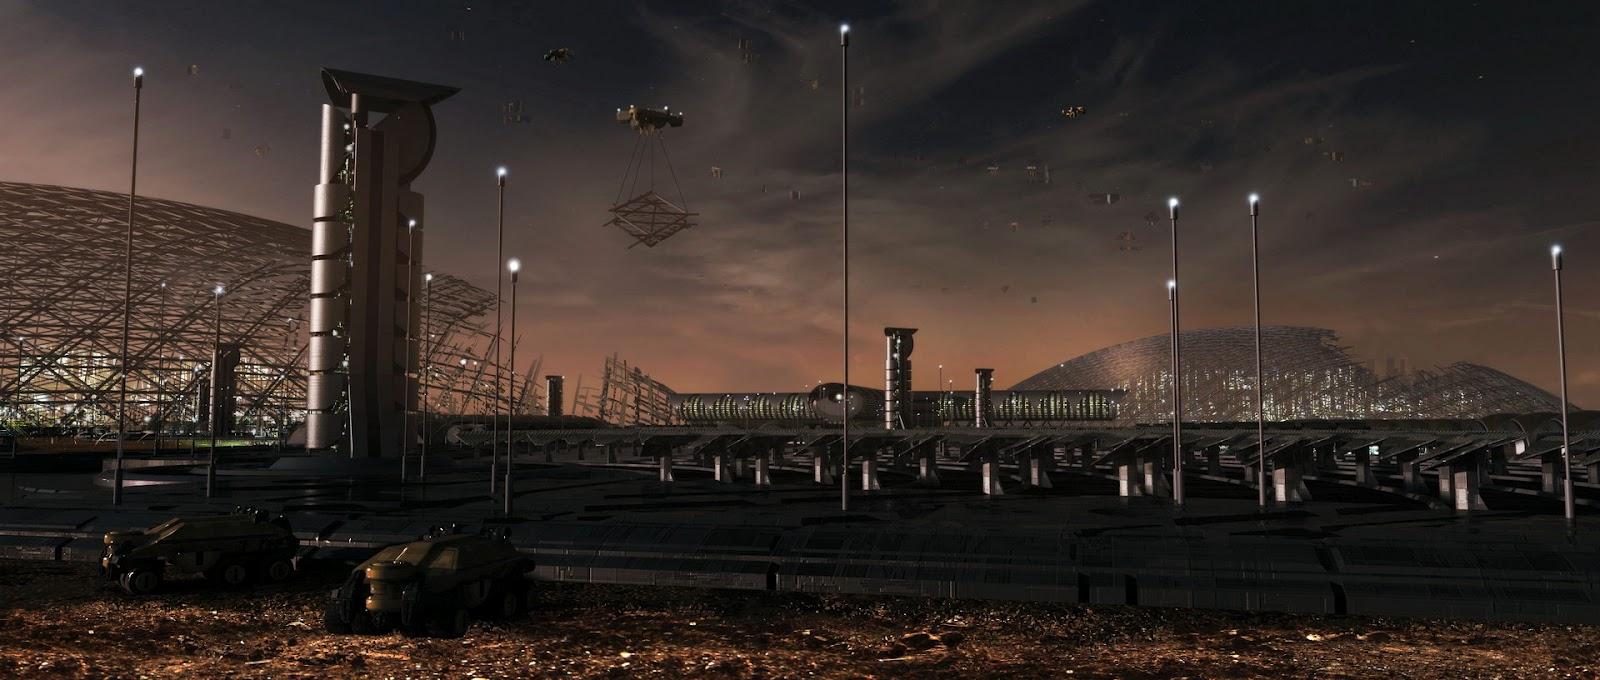 Weyland_Mars_Facility_Steve_Burg